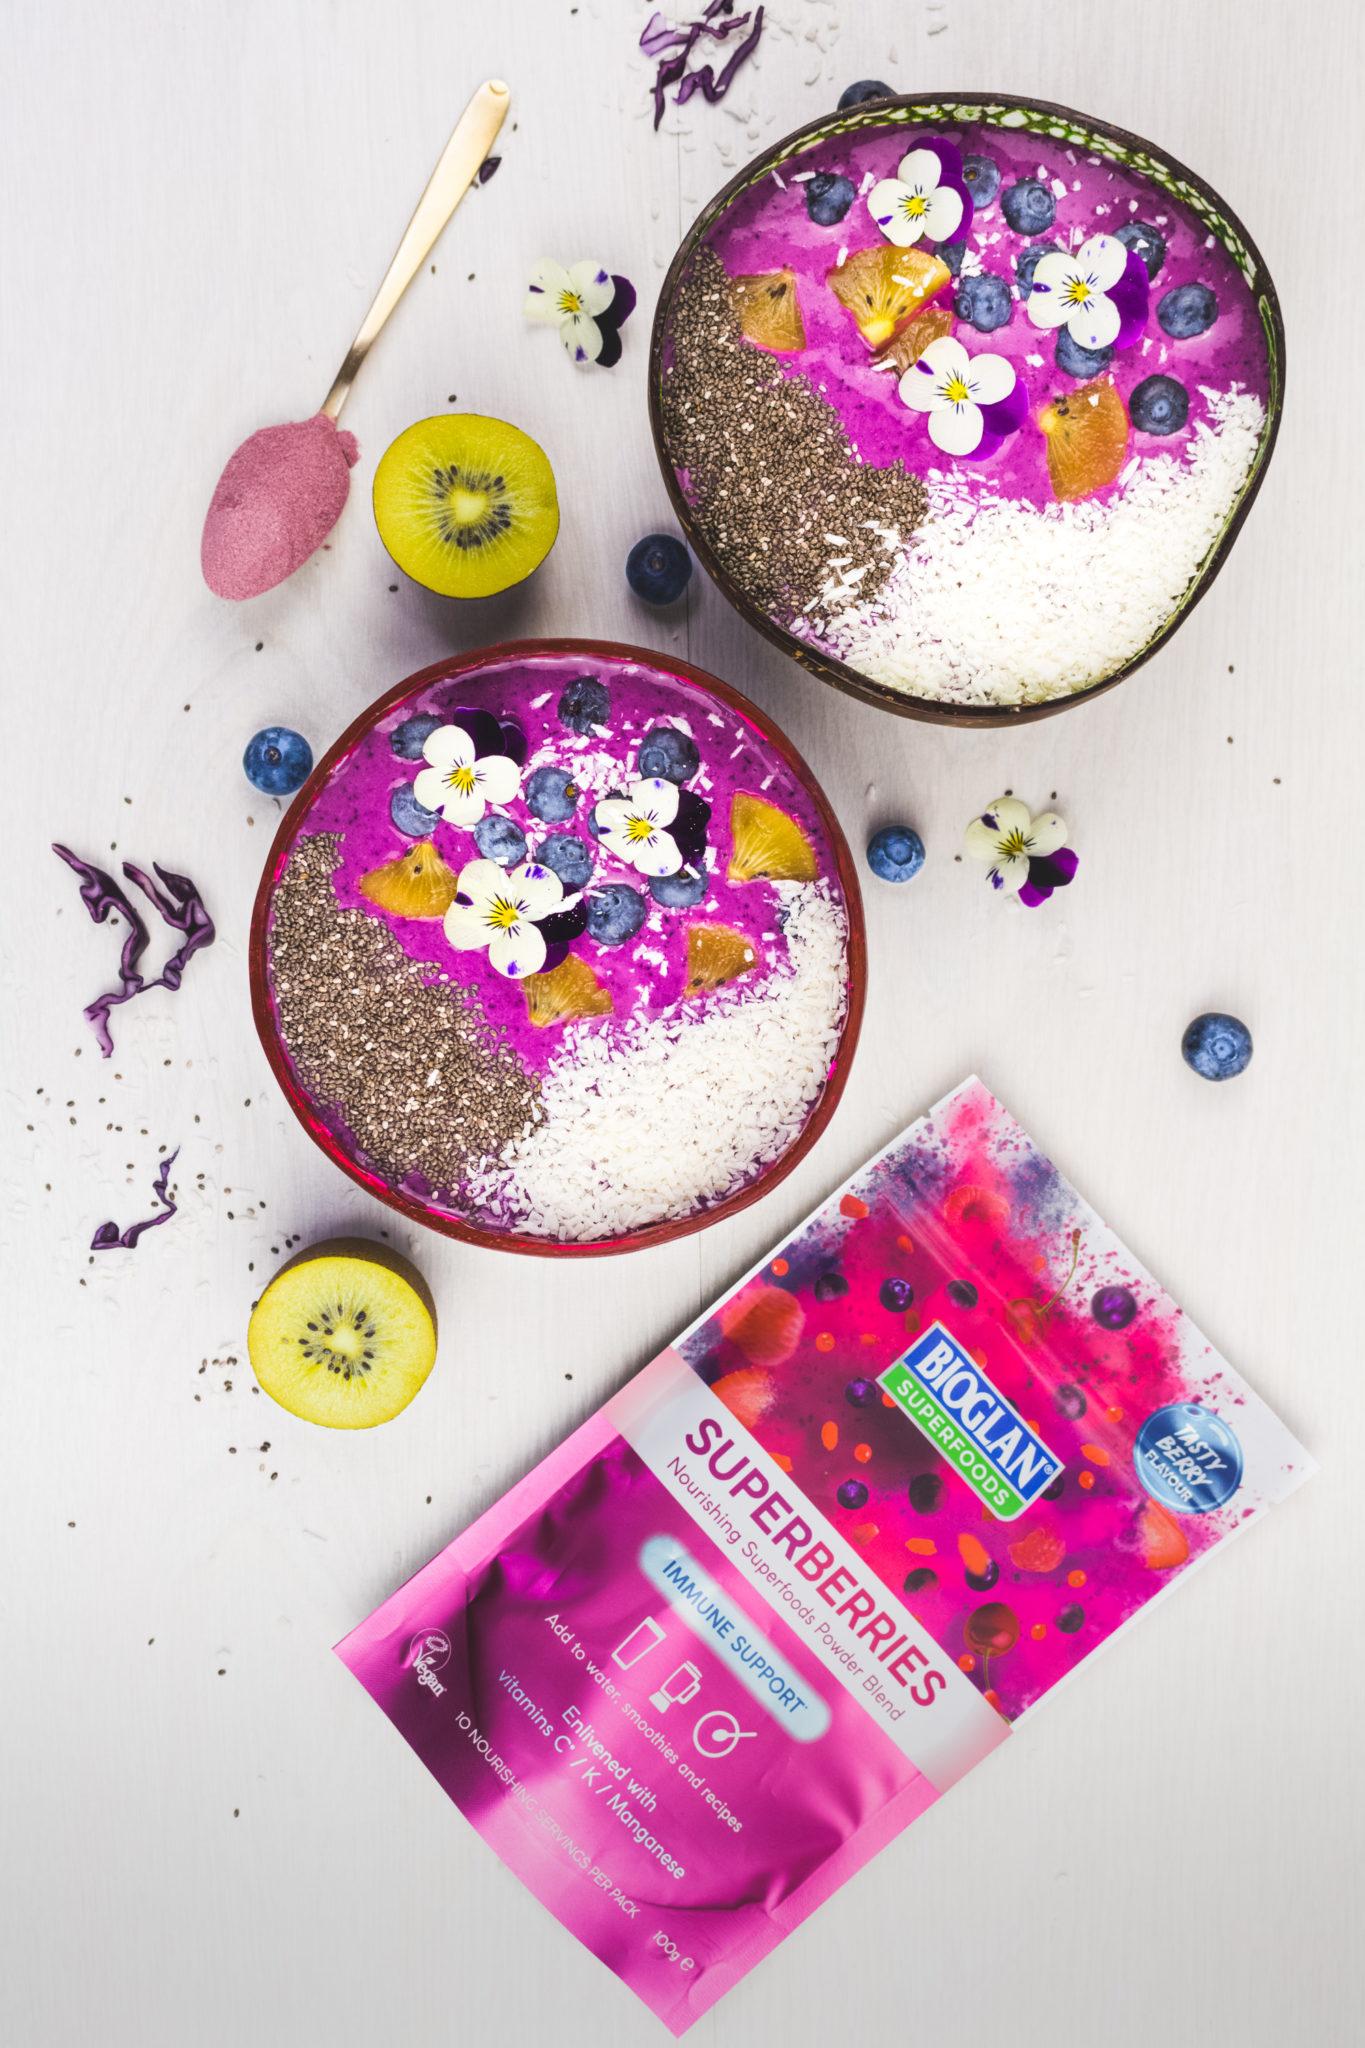 Purple smoothie bowls